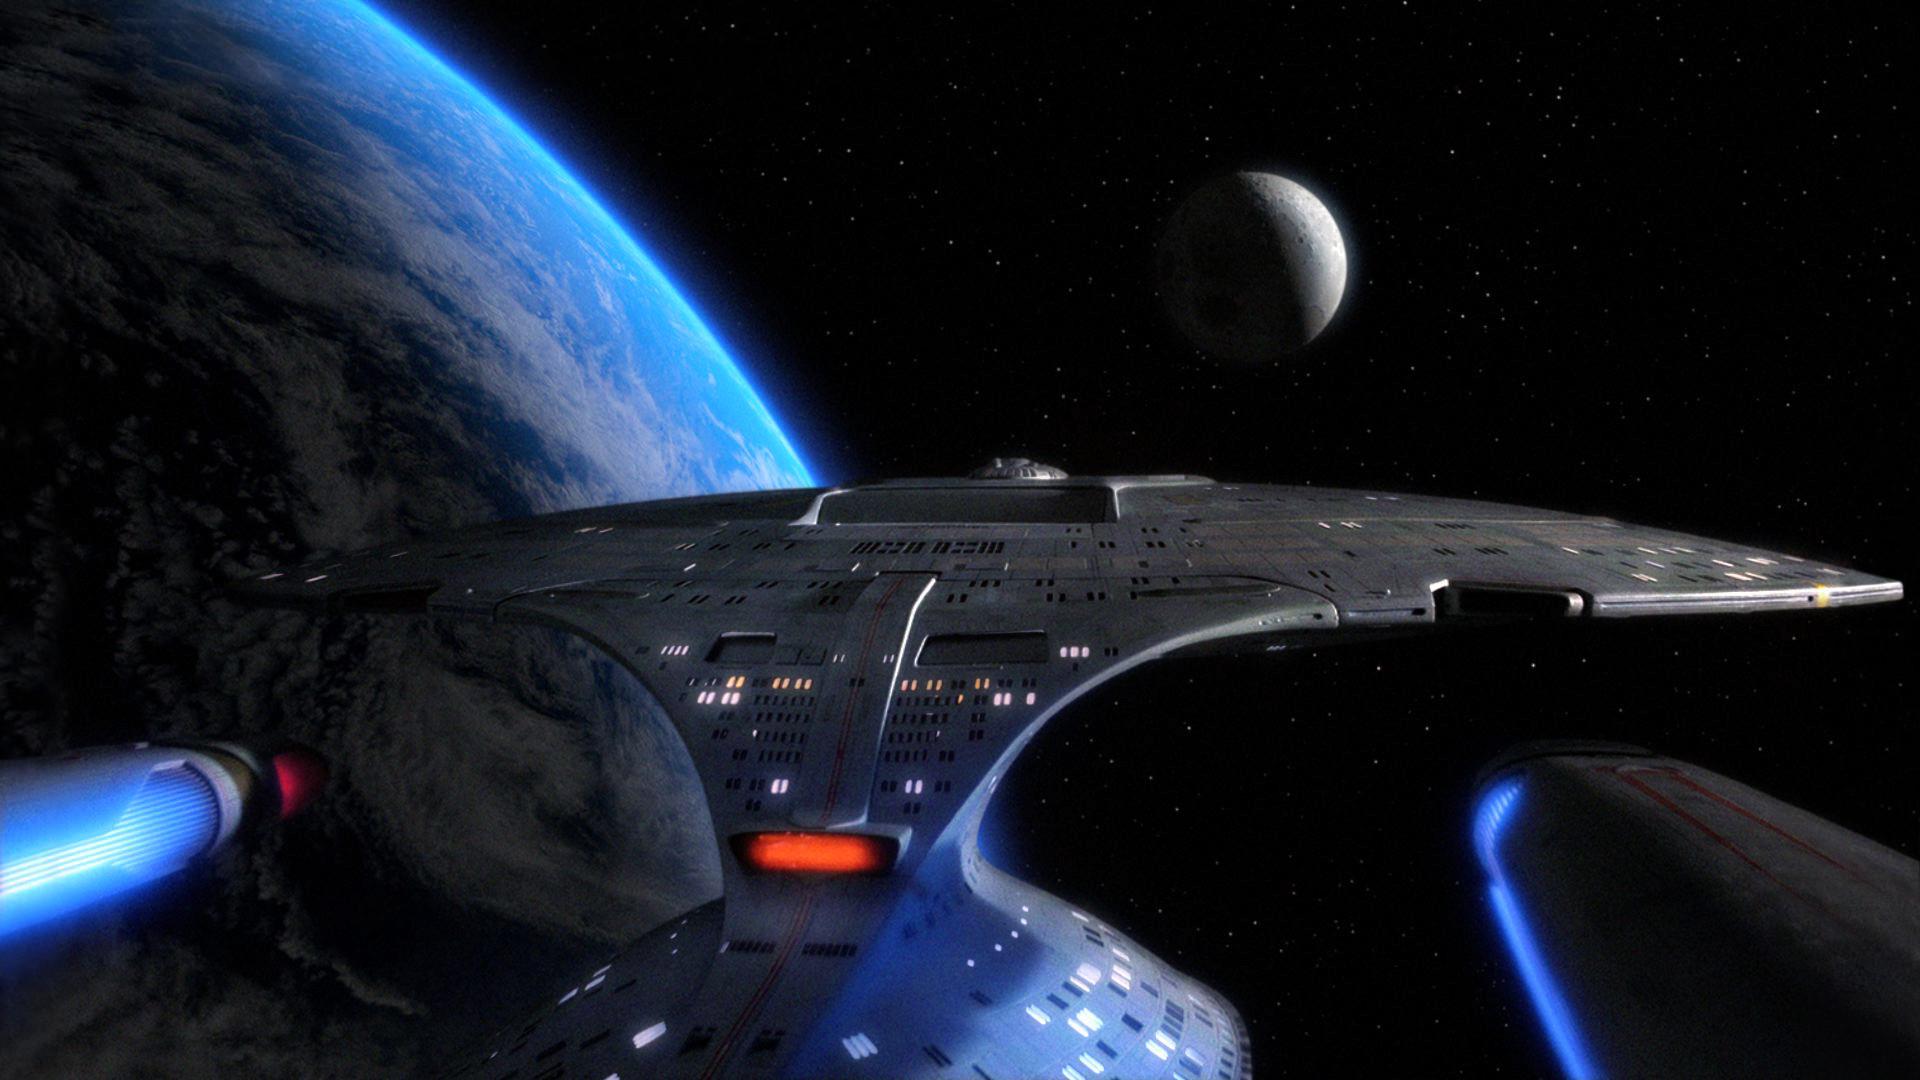 Star Trek The Next Generation Wallpaper Wallpapertag